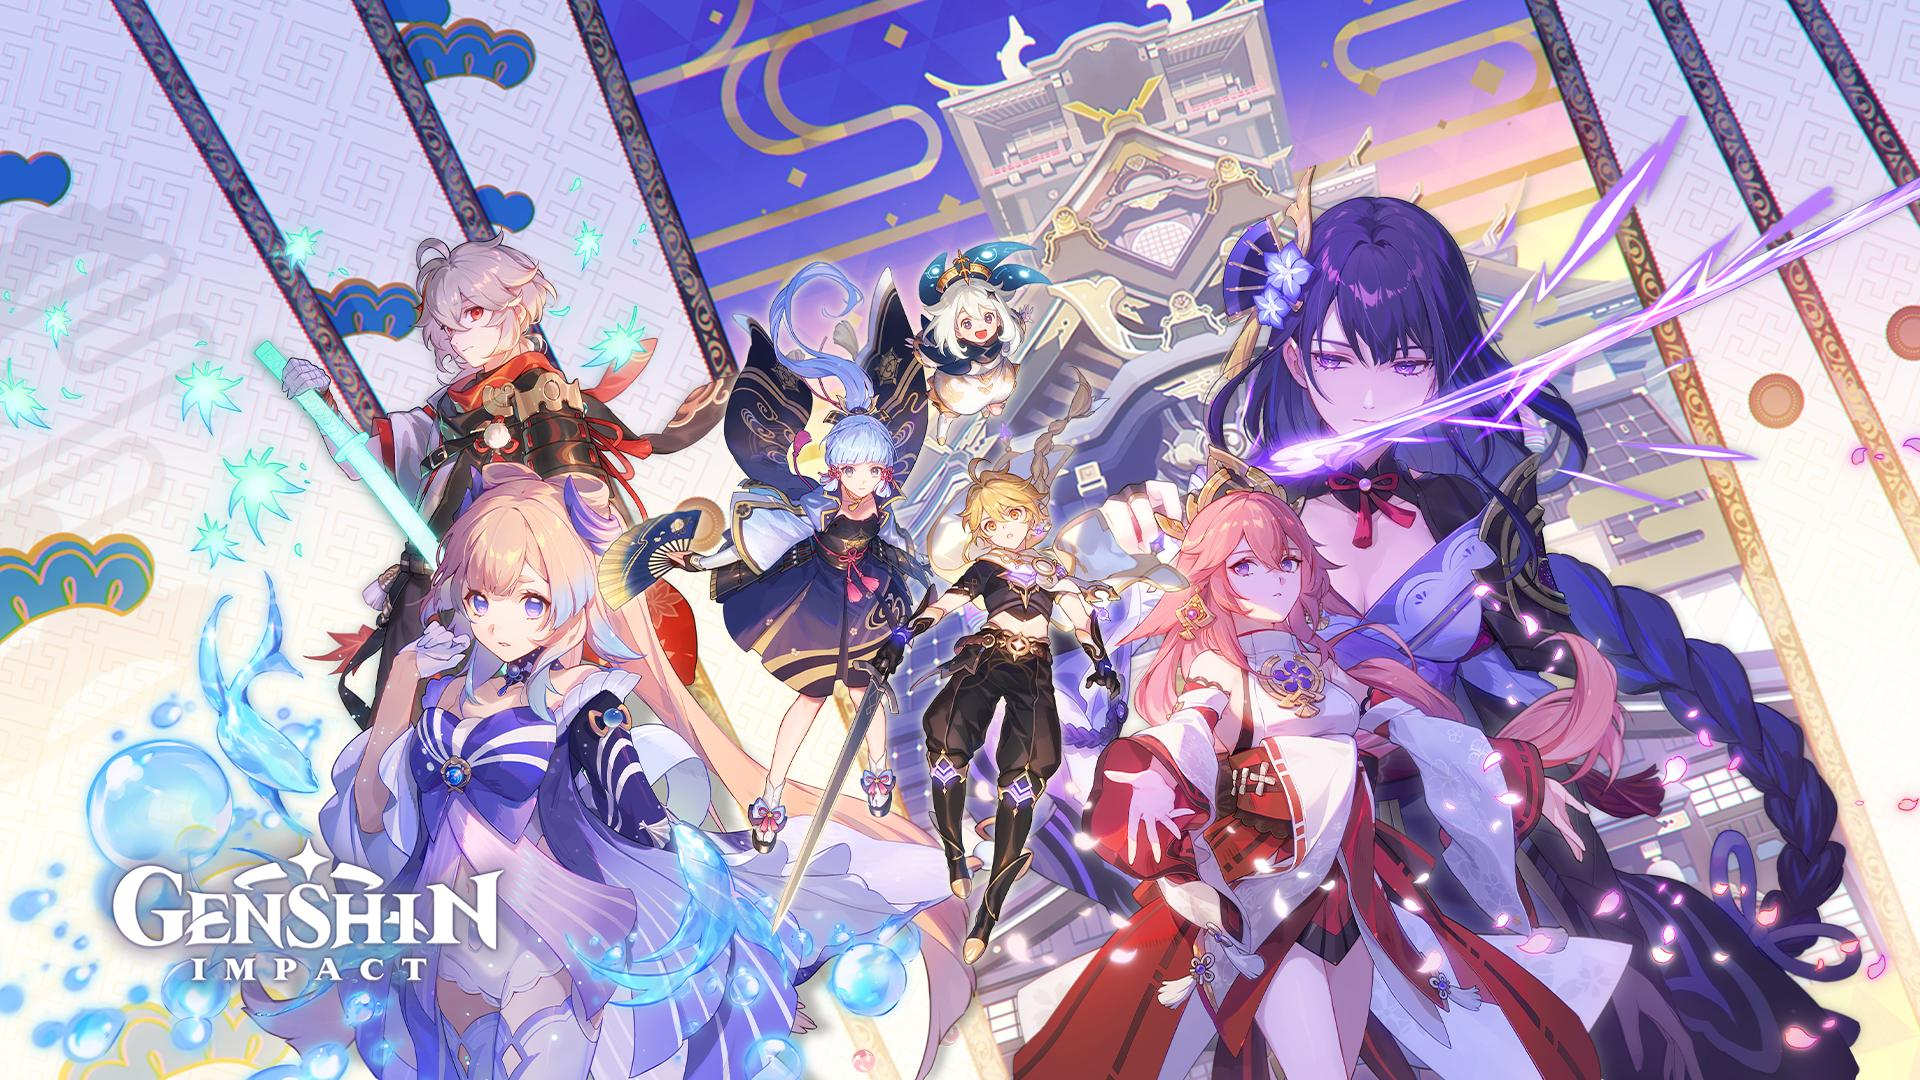 genshin-impact-kokomi-meme-story-feature-official-artwork-GamersRD